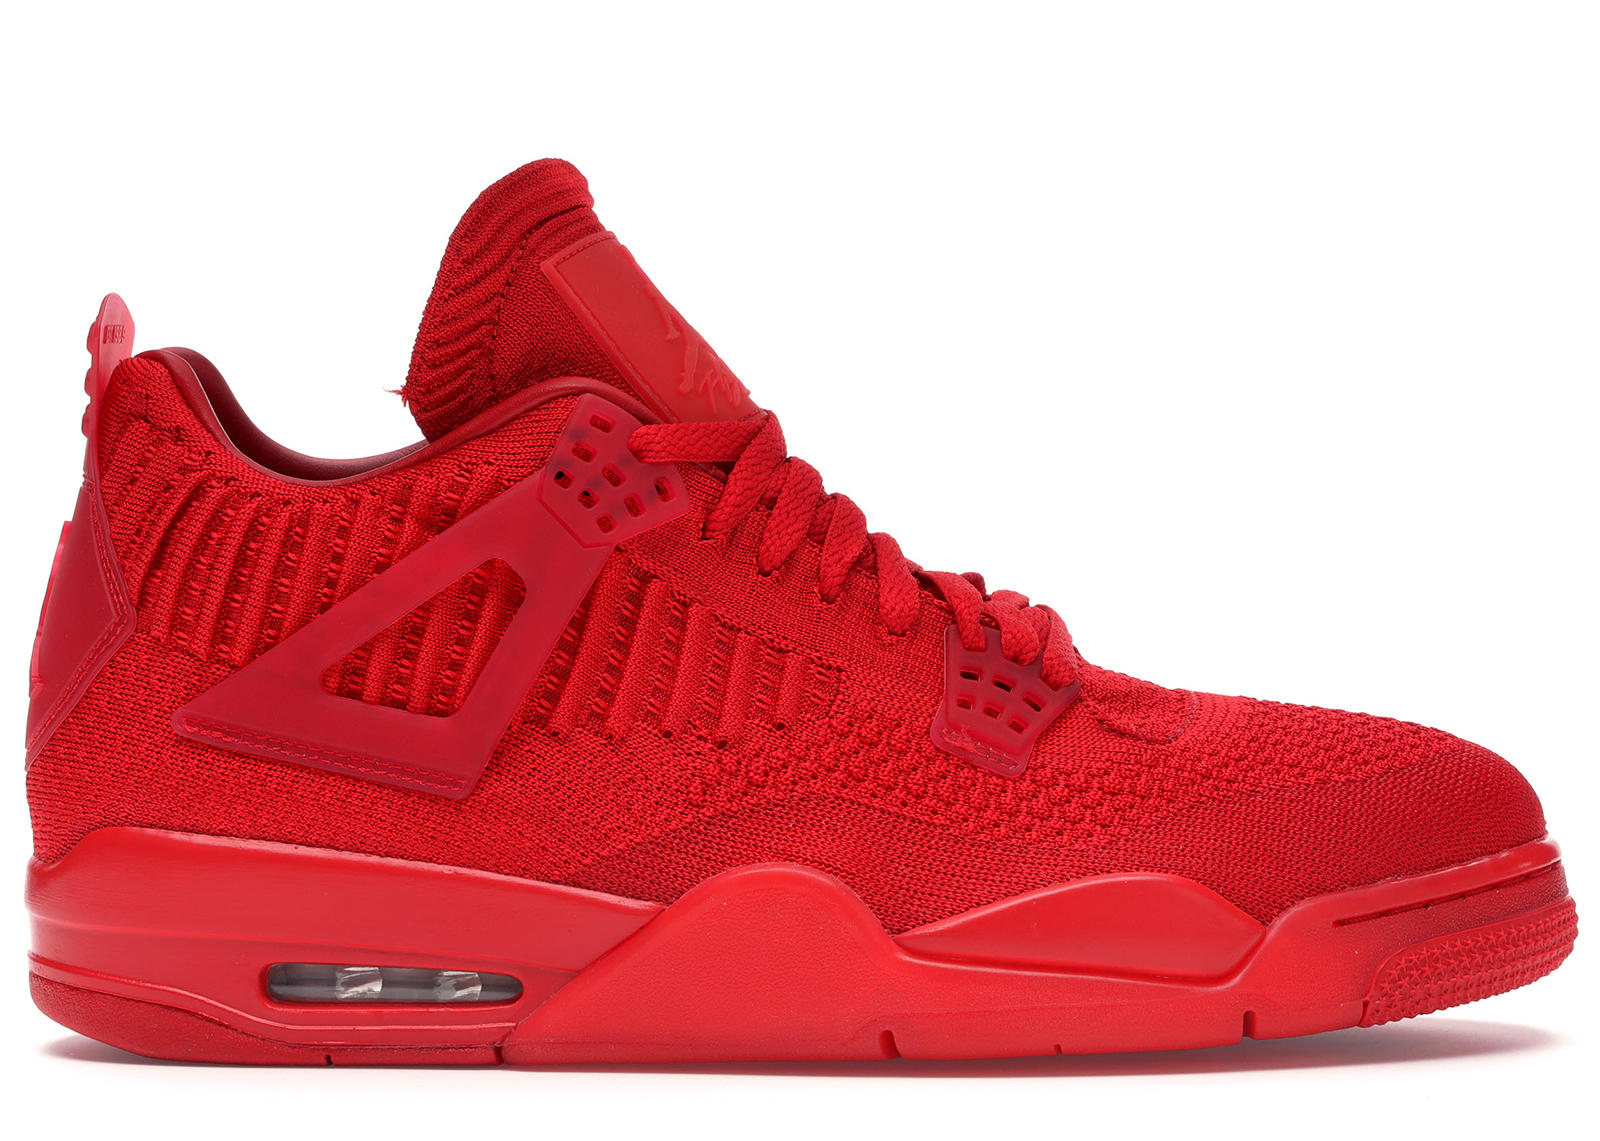 Jordan 4 Retro Flyknit Red